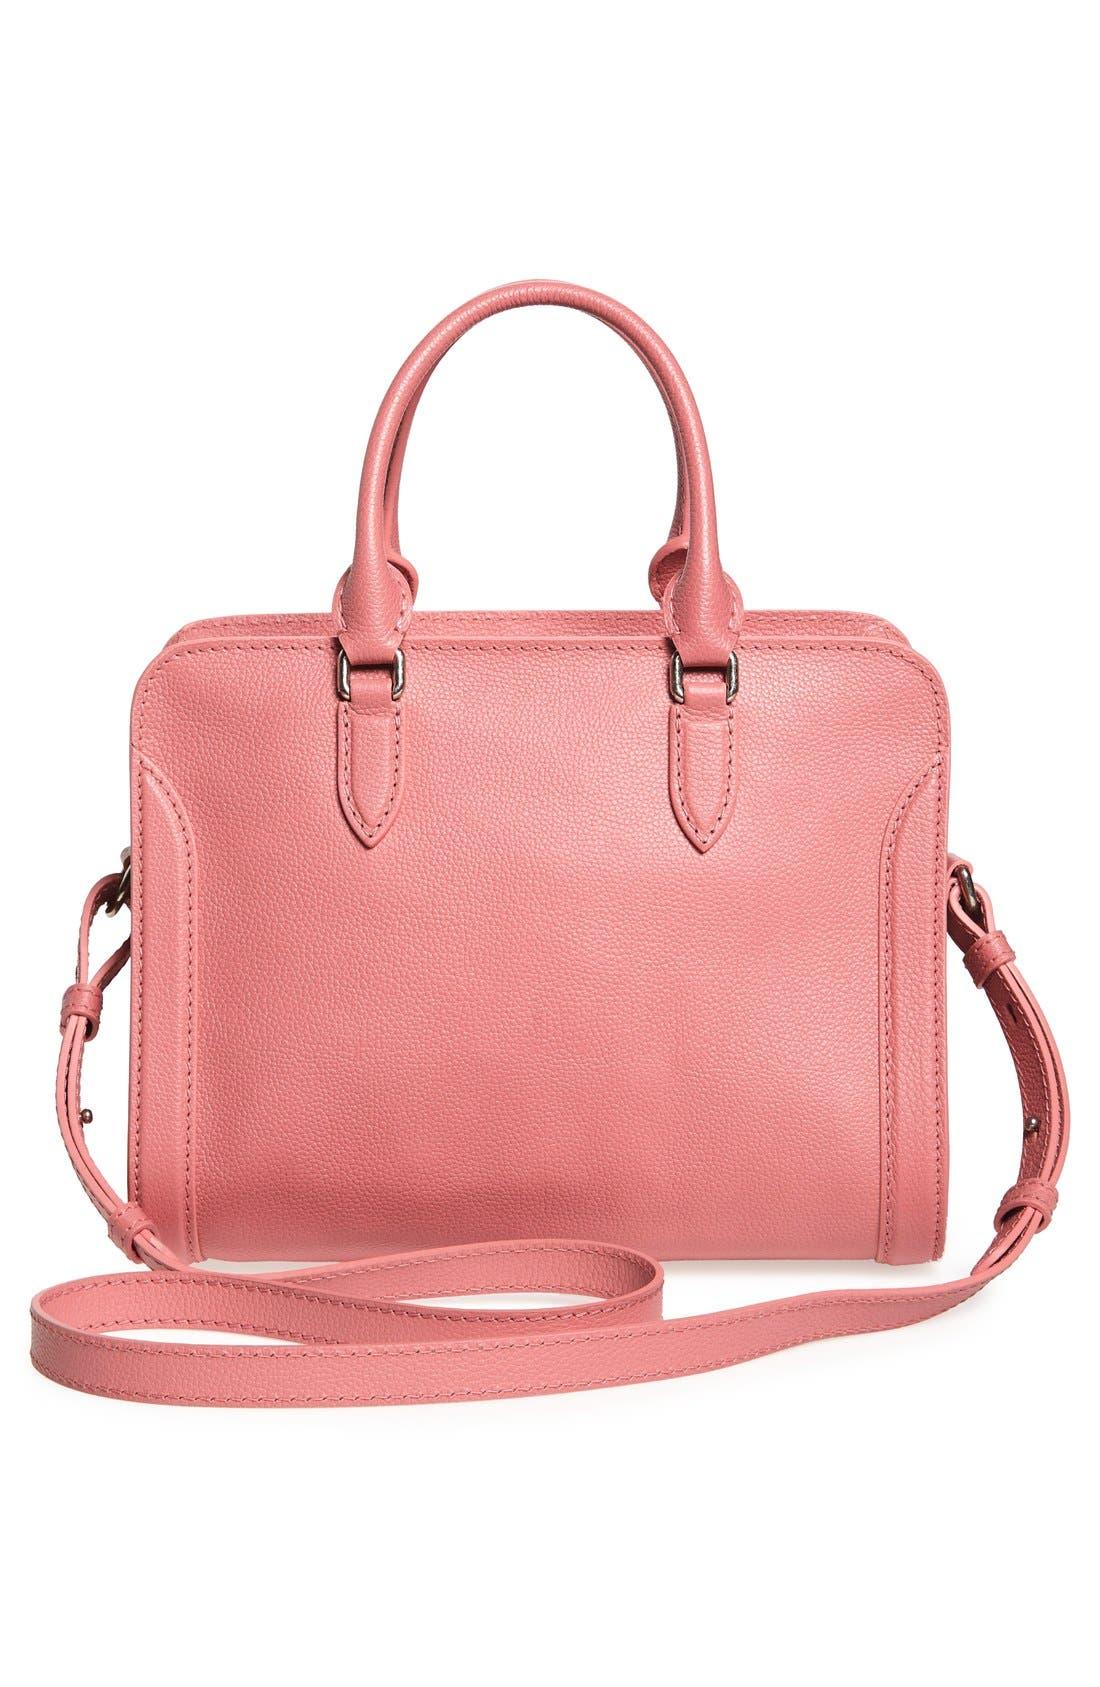 Alternate Image 3  - Alexander McQueen 'Small Padlock' Leather Duffel Bag